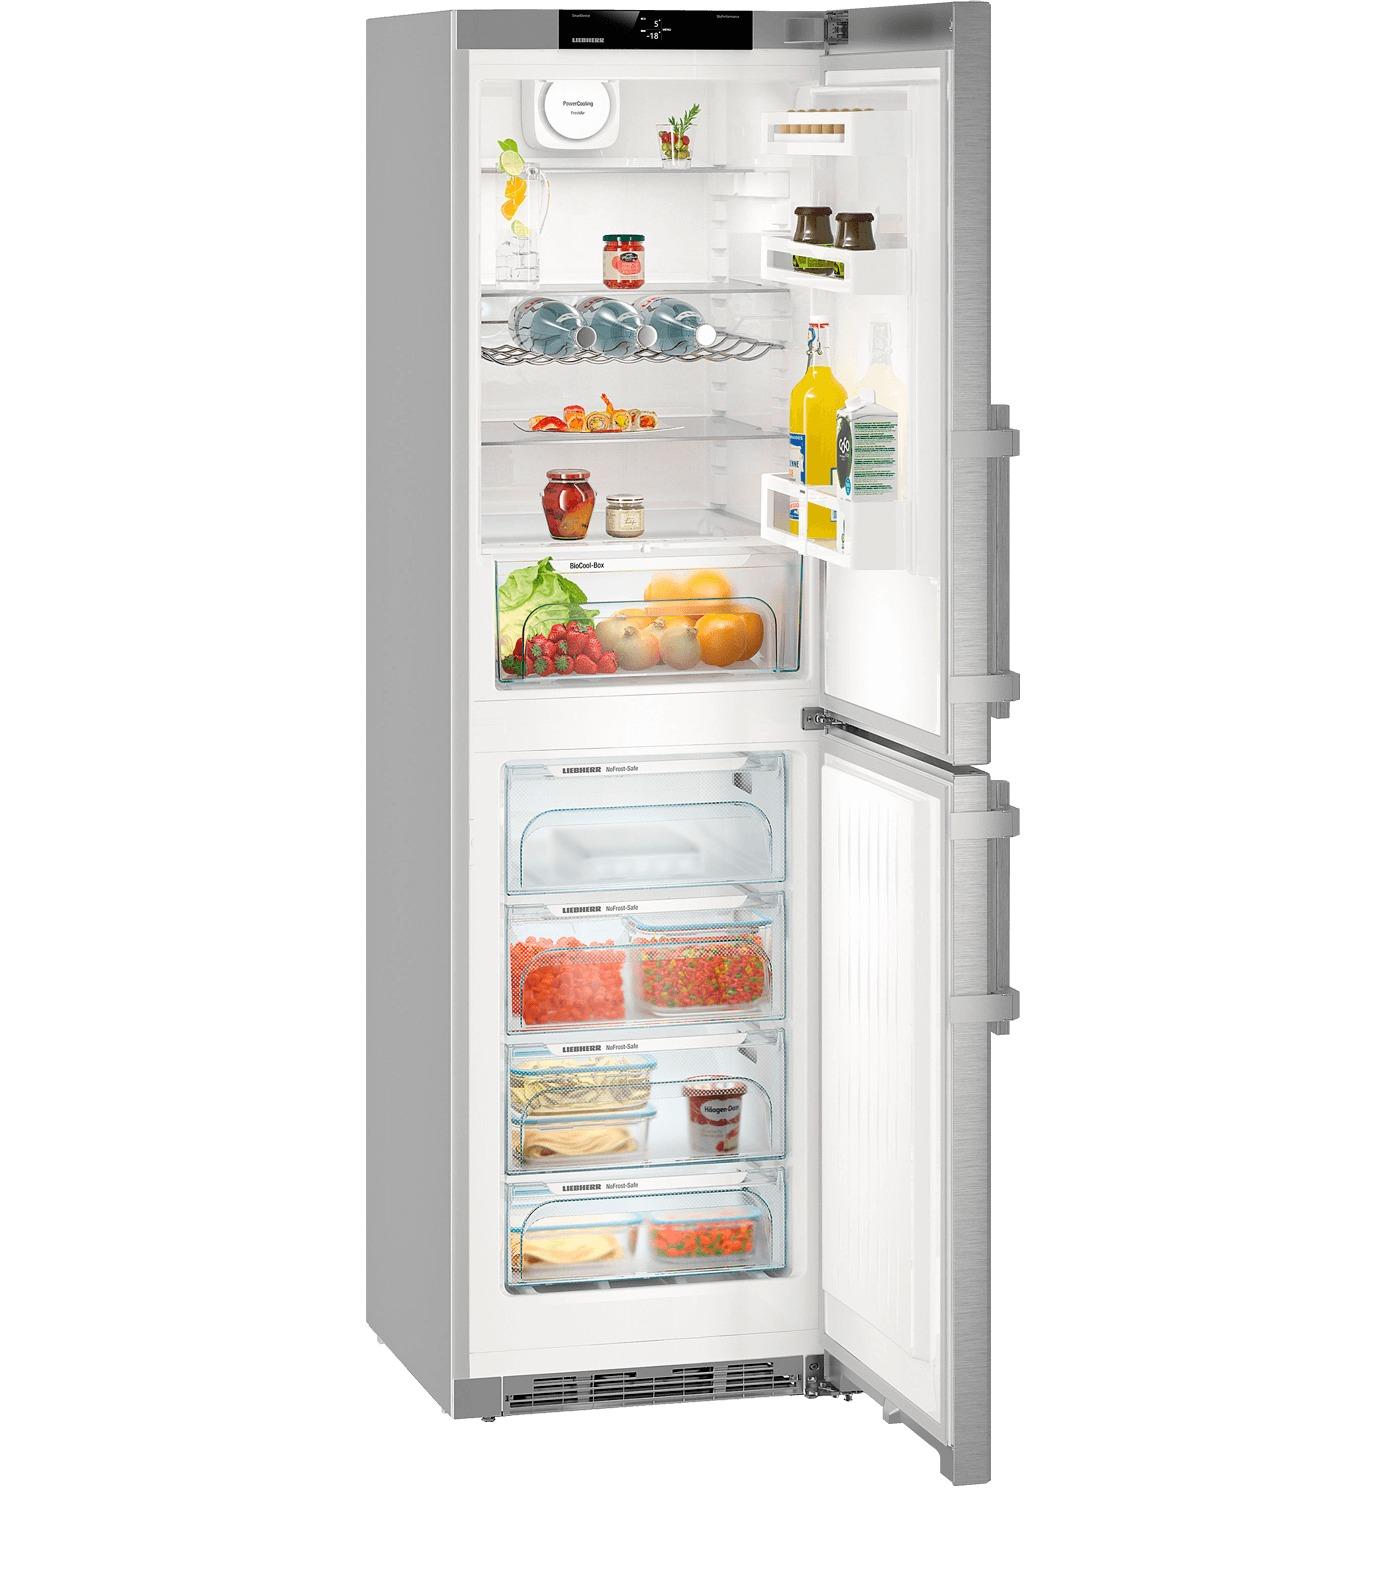 Liebherr CNef 4735-20 koelkast met vriesvak - Prijsvergelijk